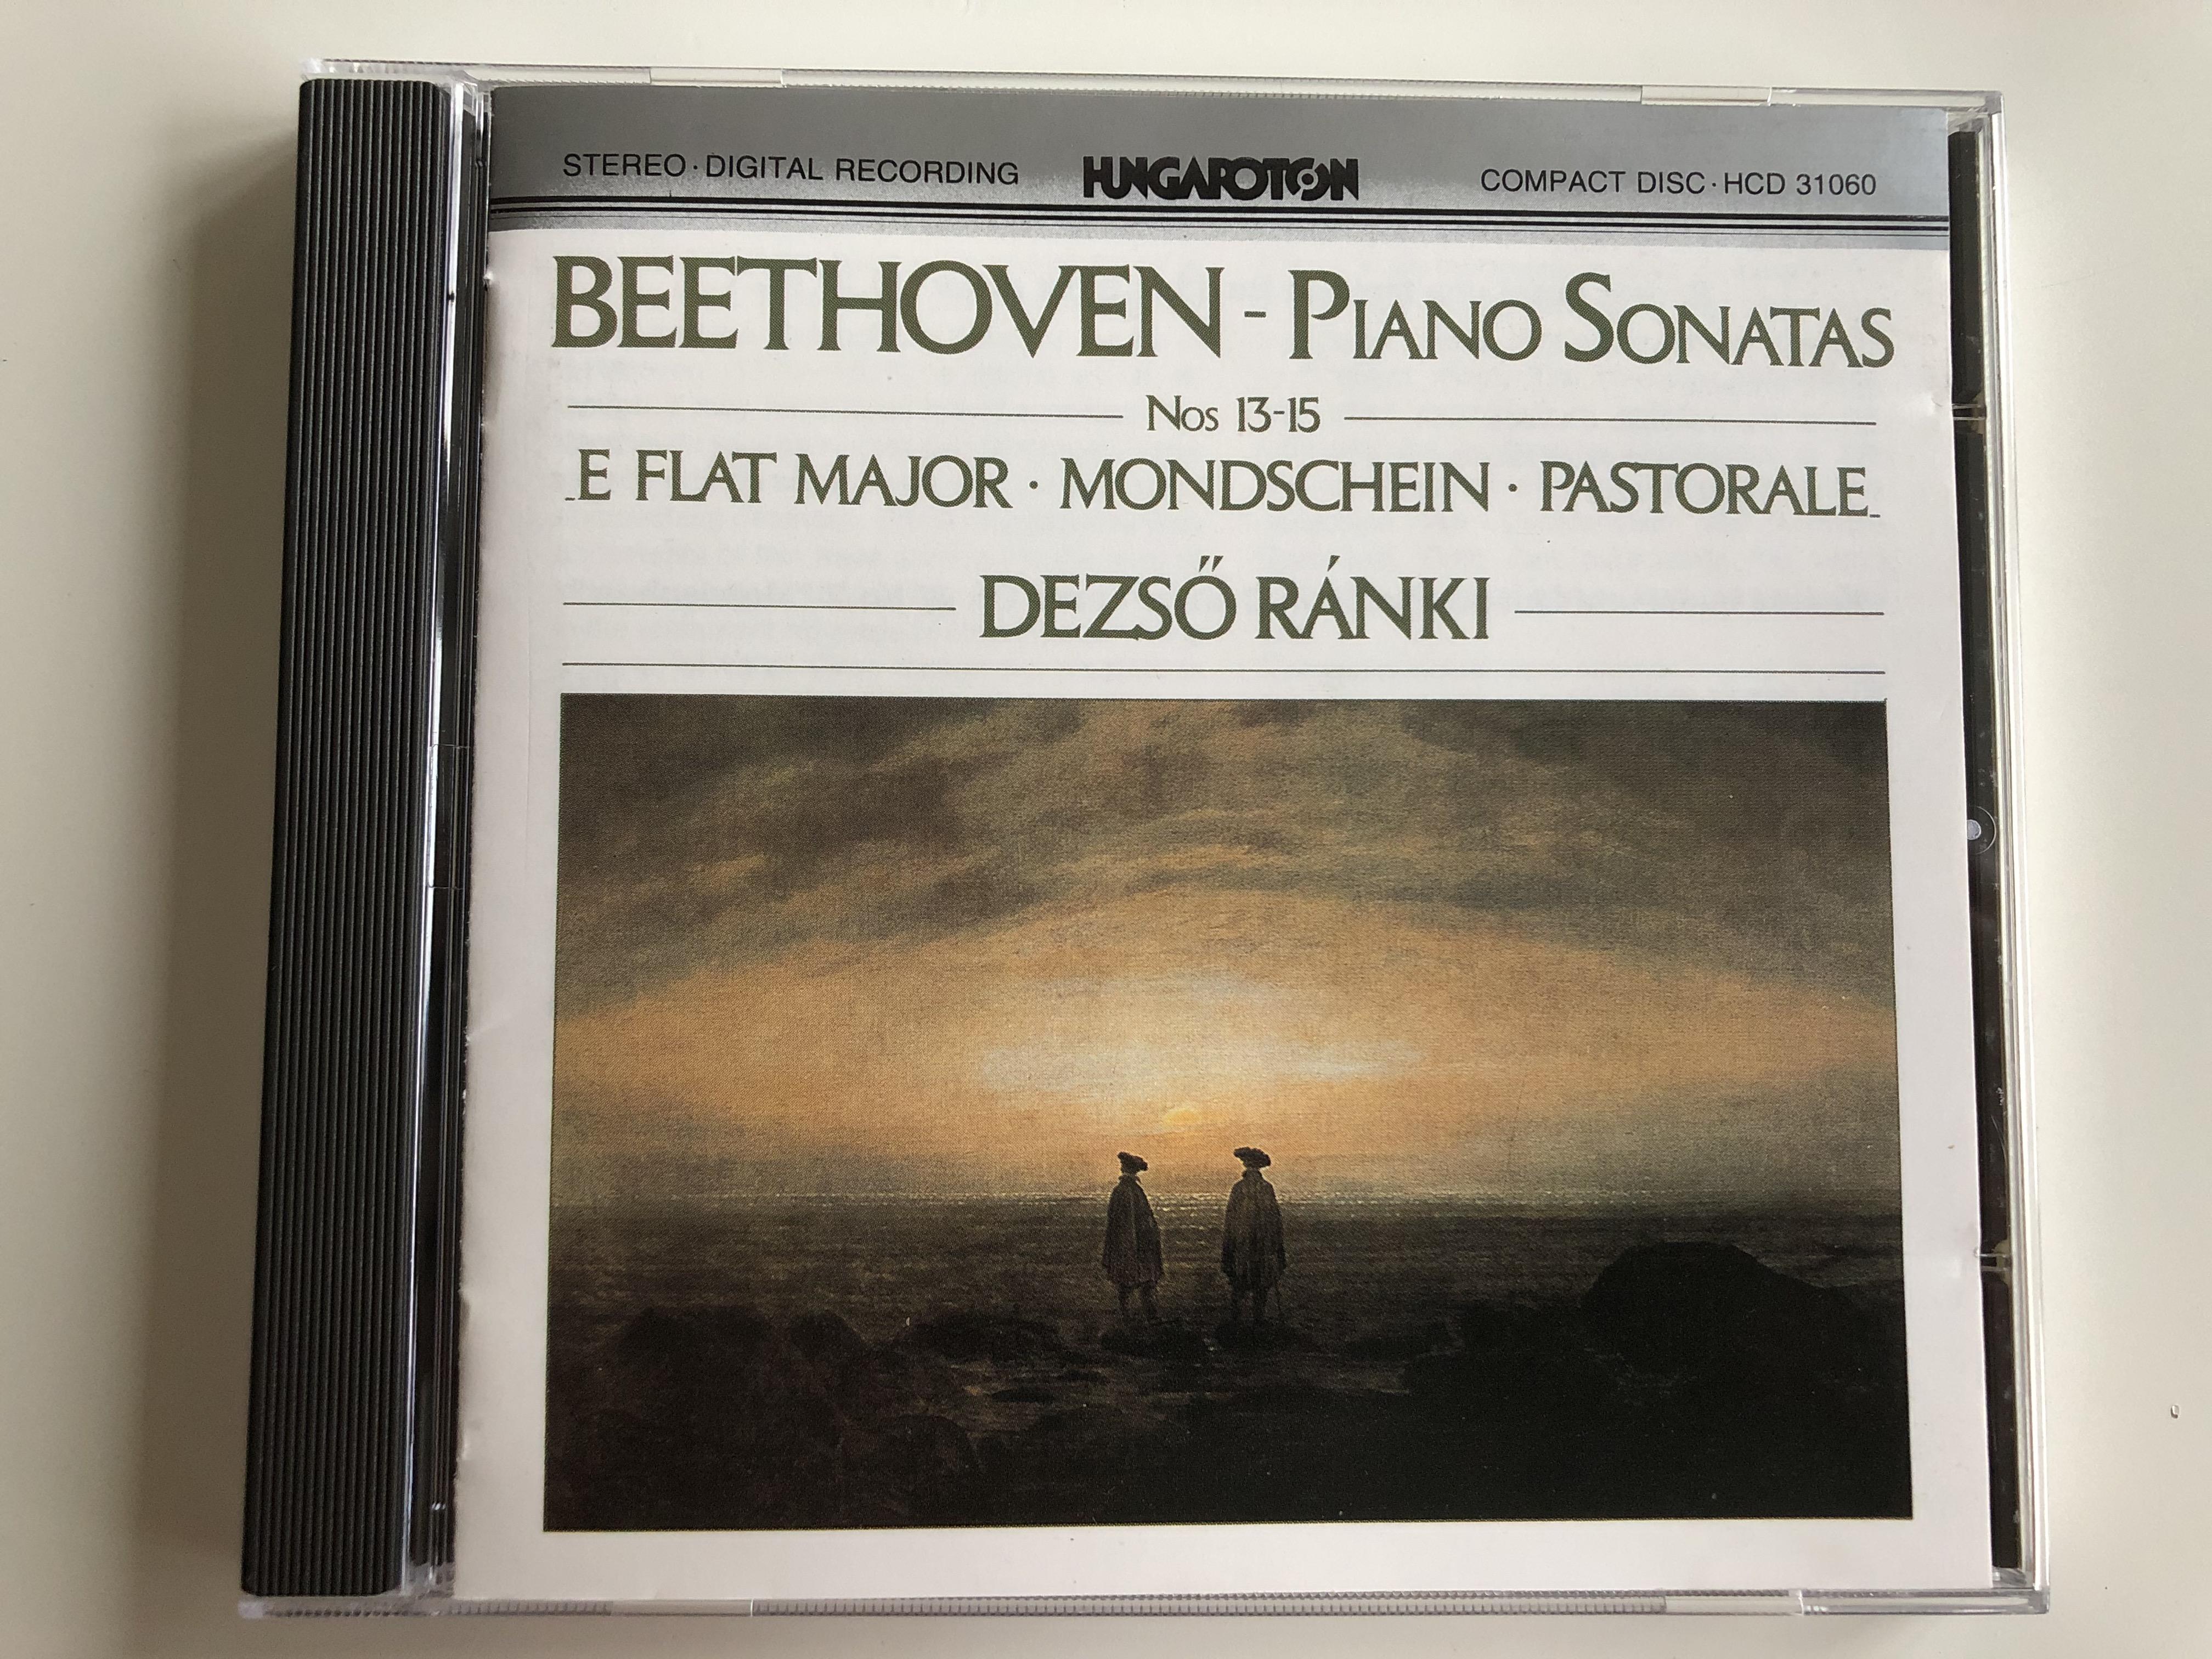 beethoven-piano-sonatas-nos-13-15-e-flat-major-mondschein-pastorale-dezs-r-nki-hungaroton-audio-cd-1989-stereo-hcd-31060-1-.jpg